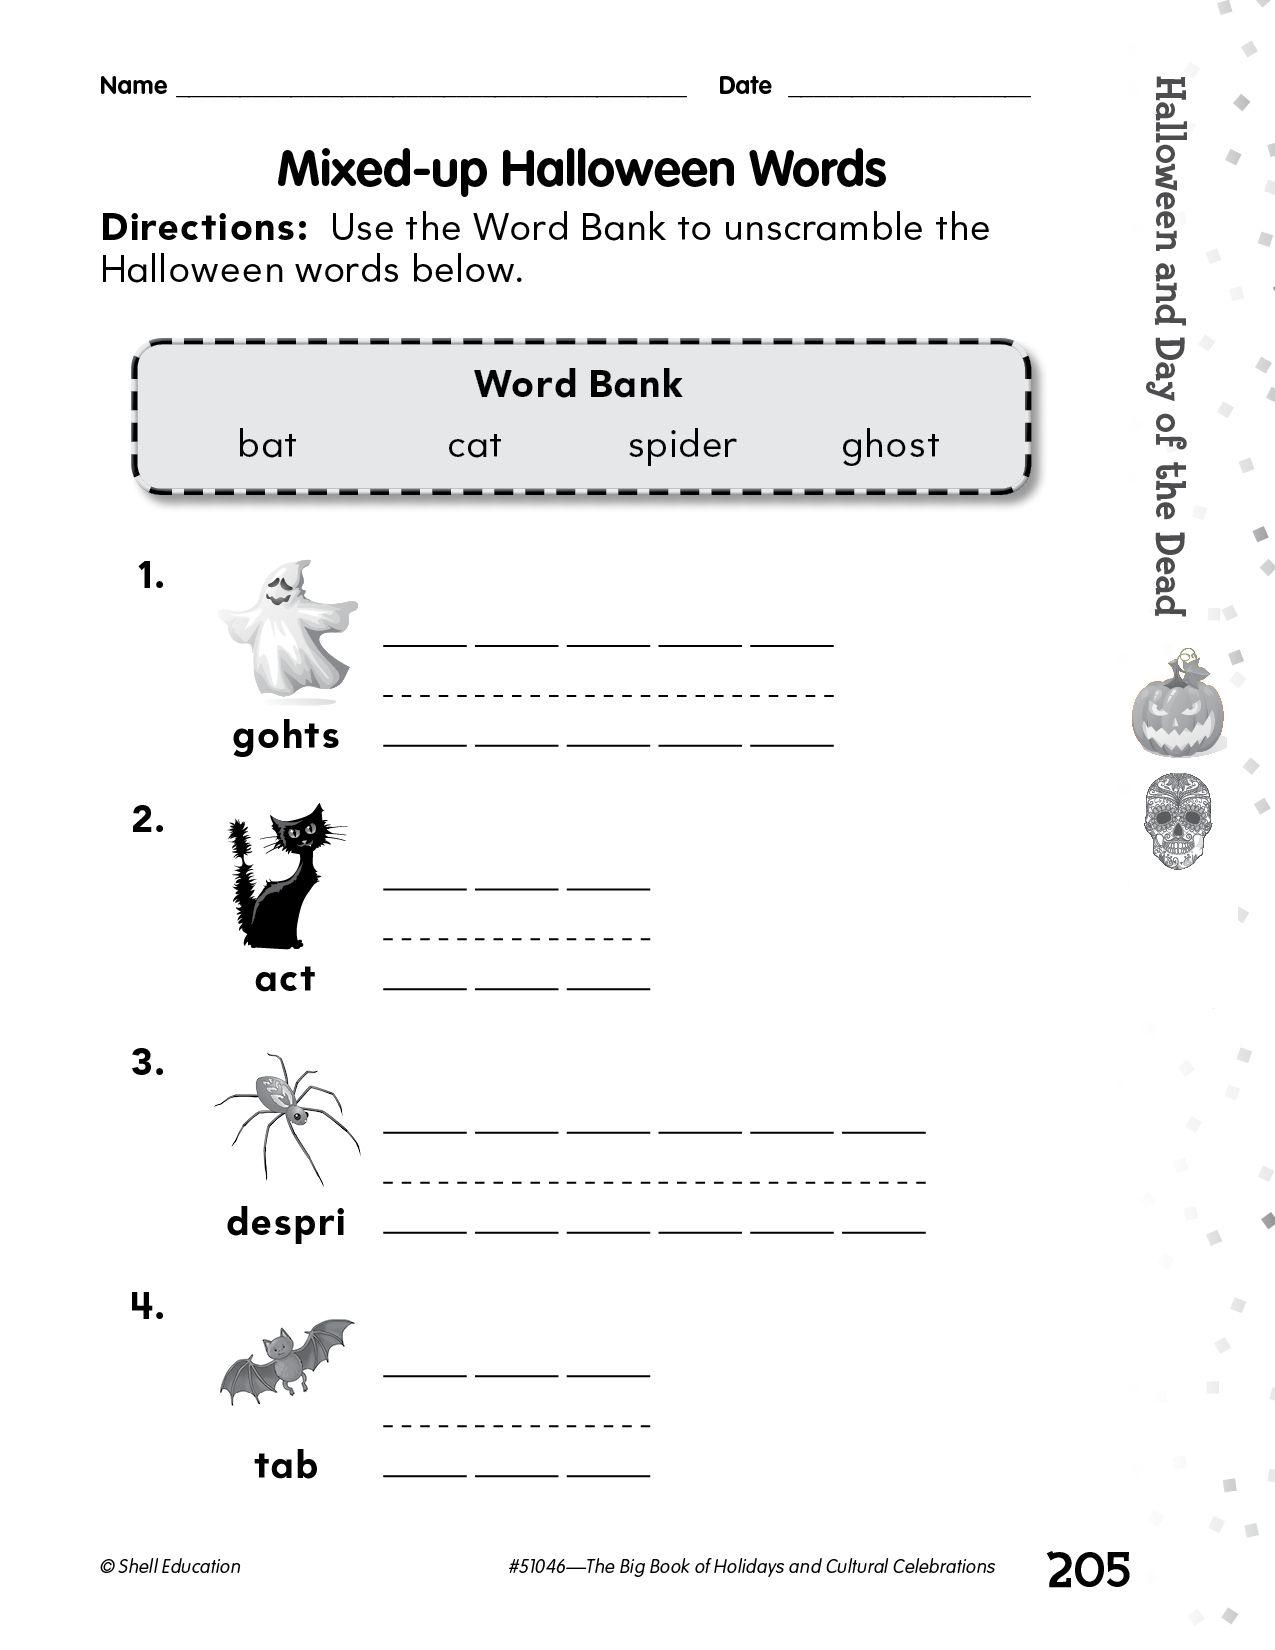 Enjoy This Festive Halloween Word Scramble Activity From